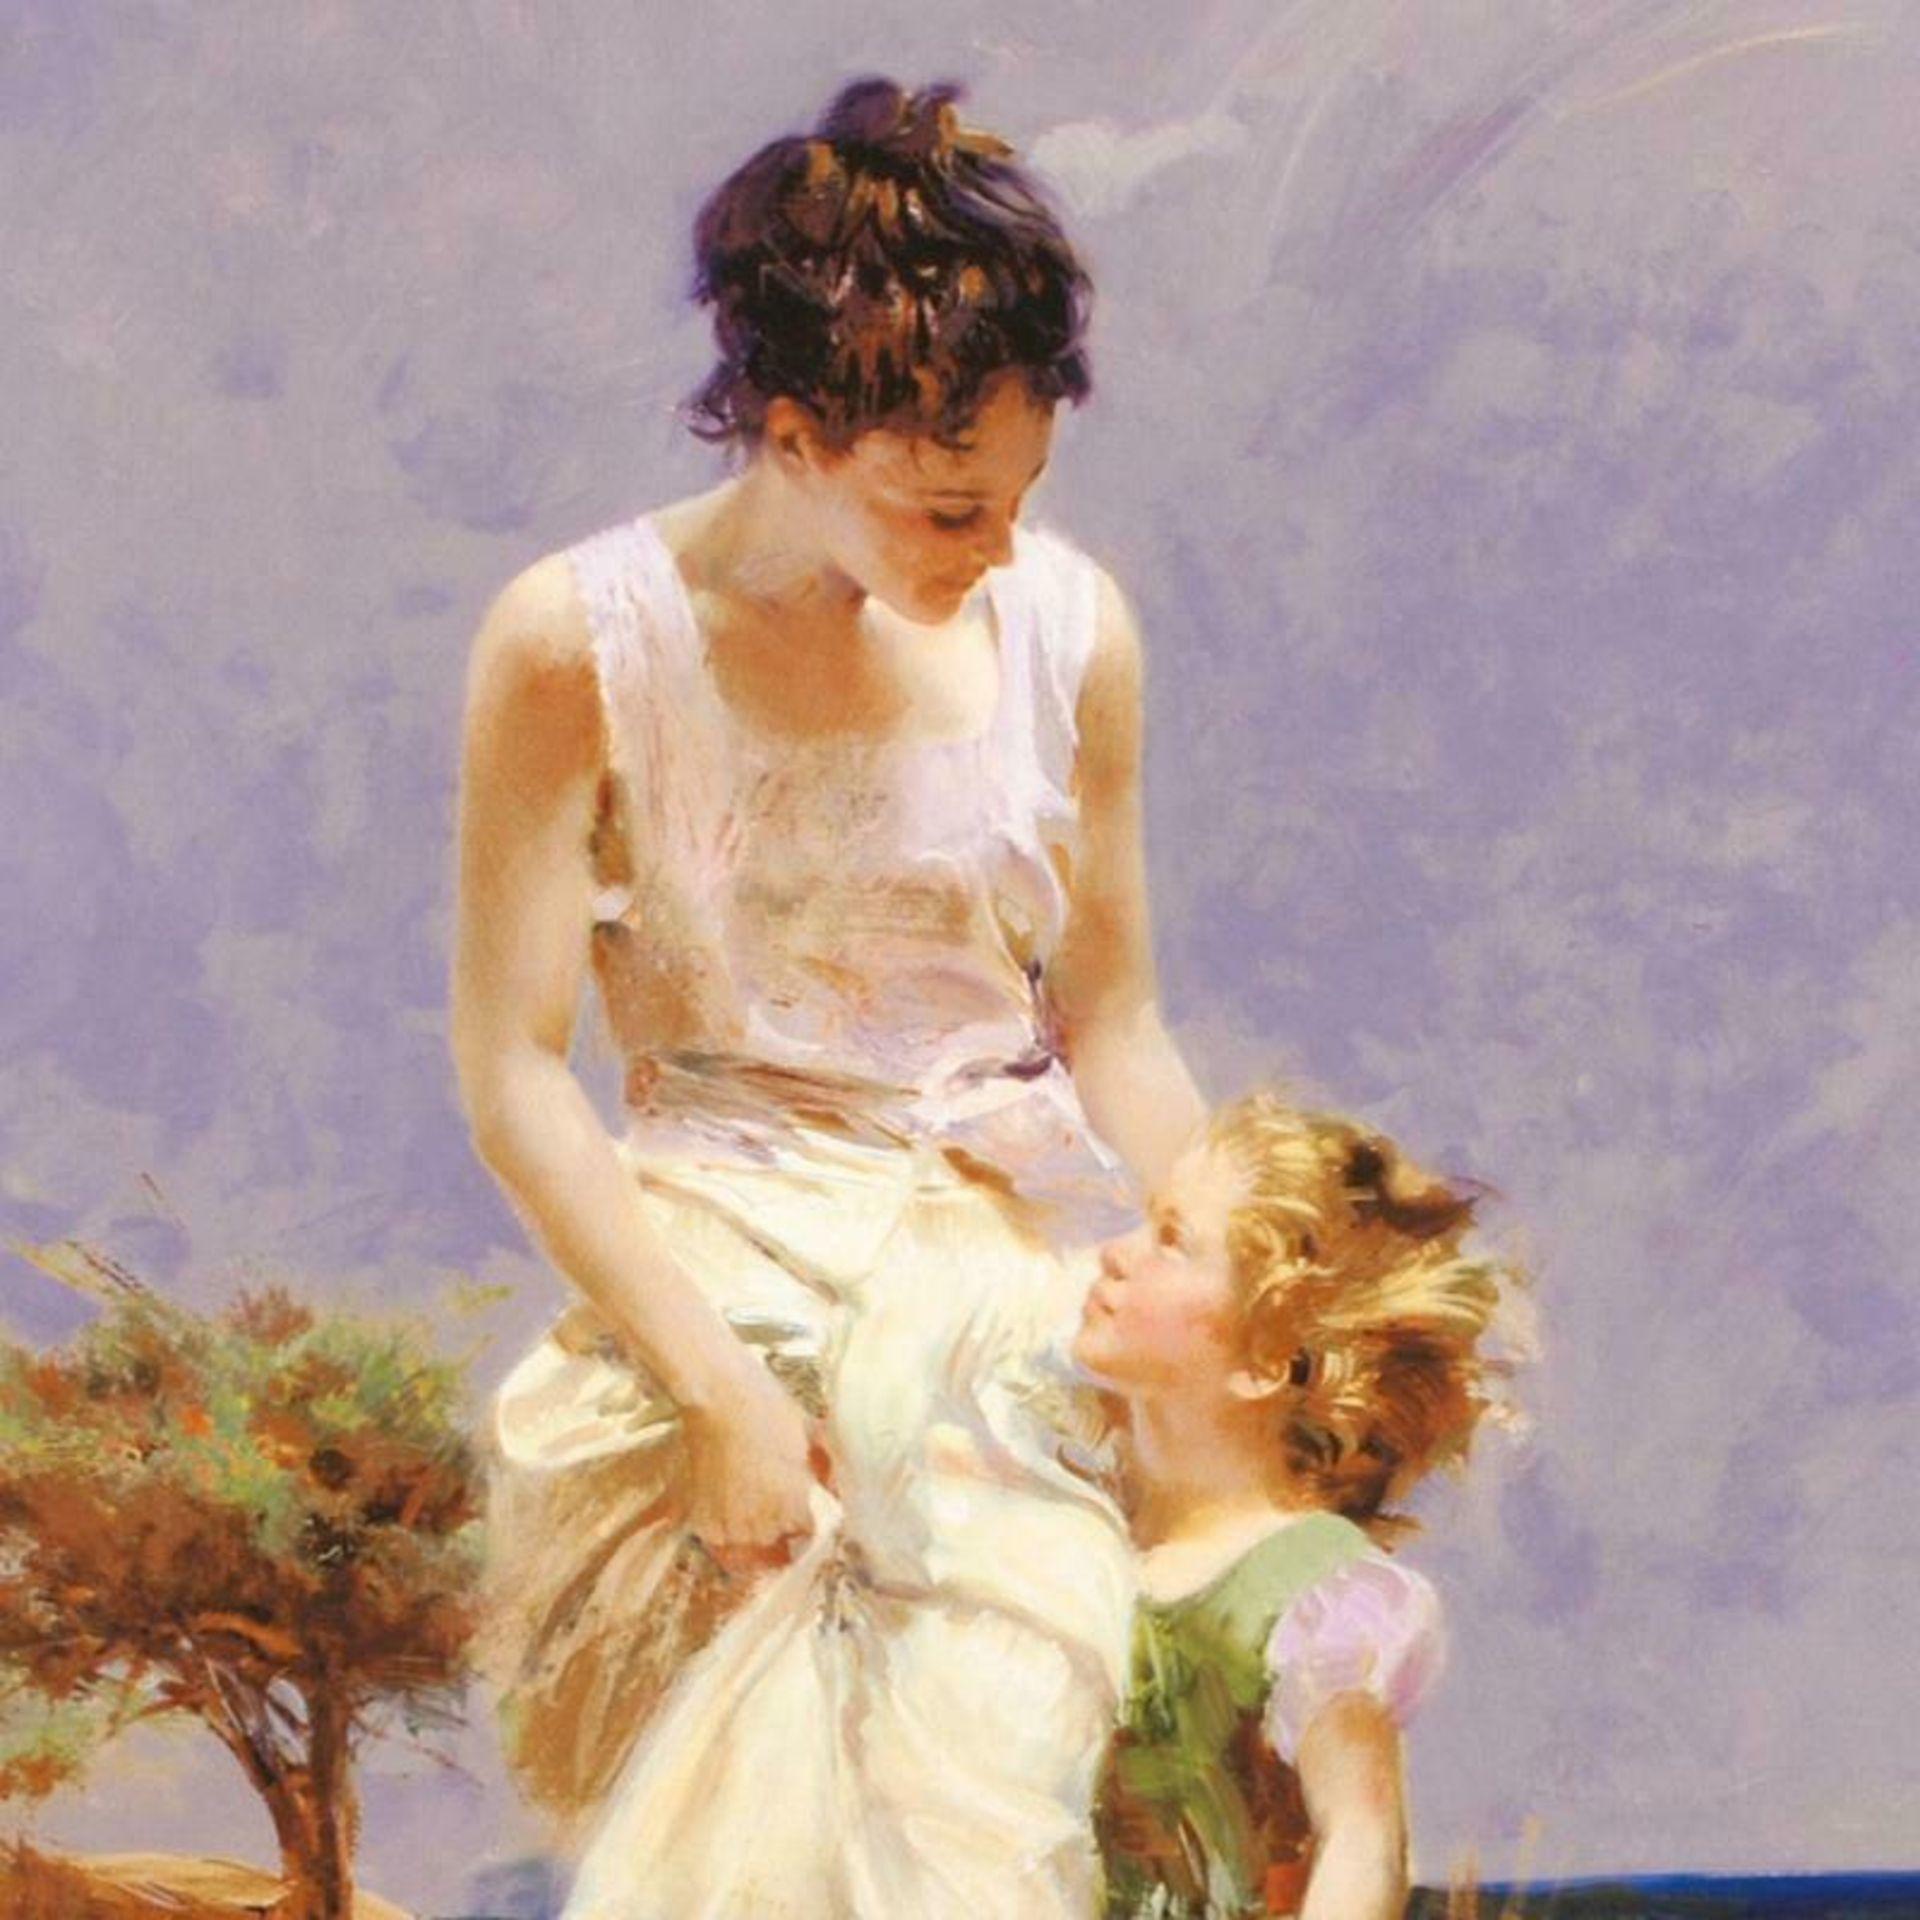 Joyful Memories by Pino (1939-2010) - Image 2 of 2